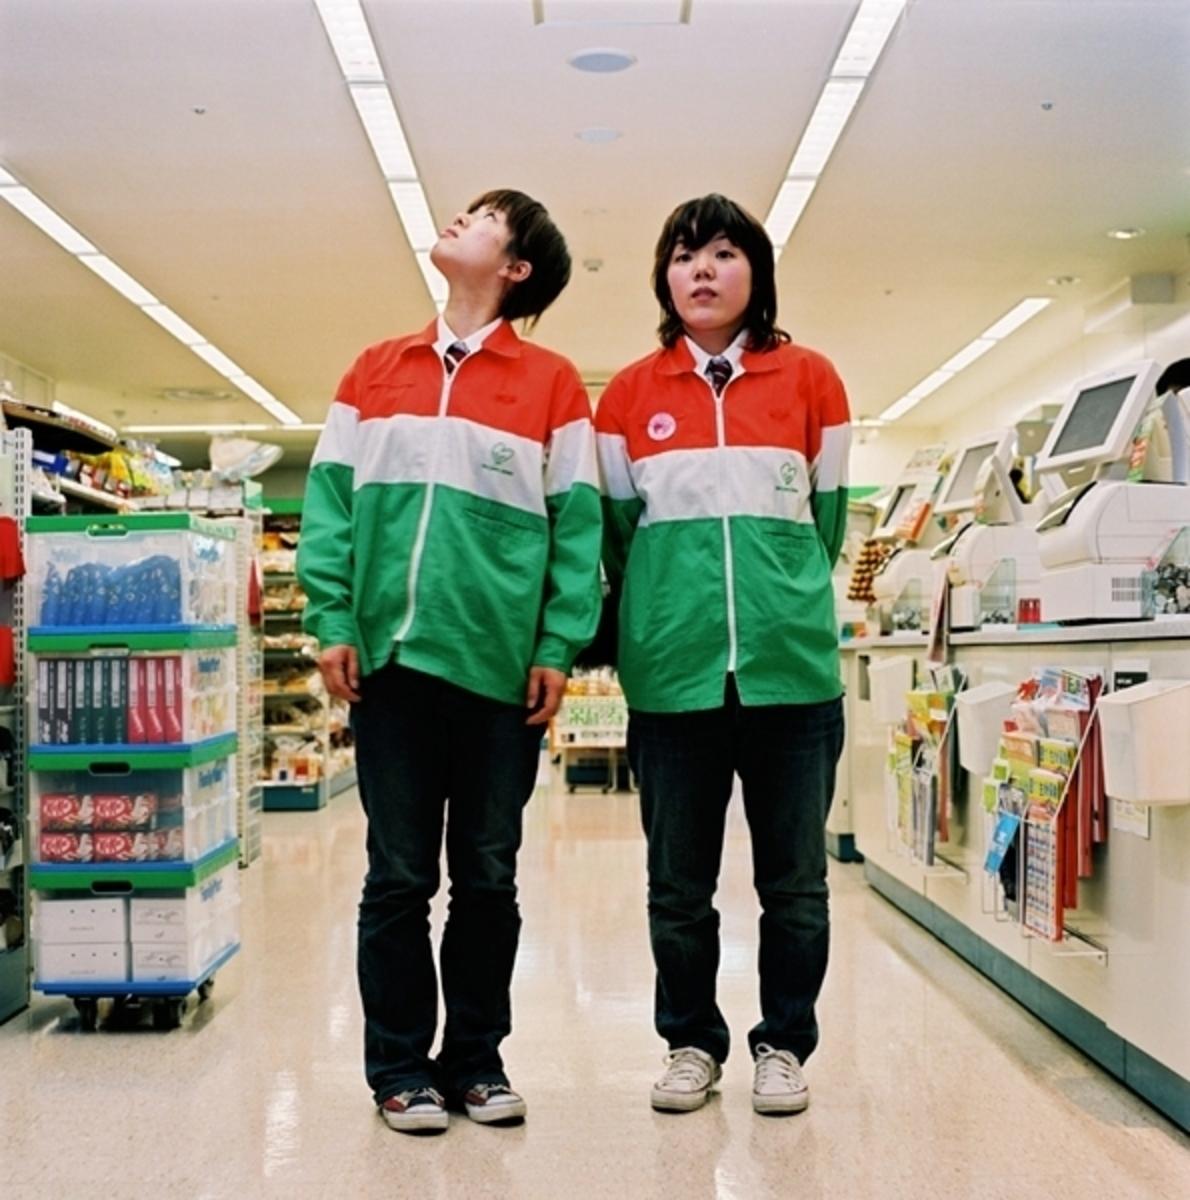 We Love Green Convenience Store, Roppongi Hills, Tokyo